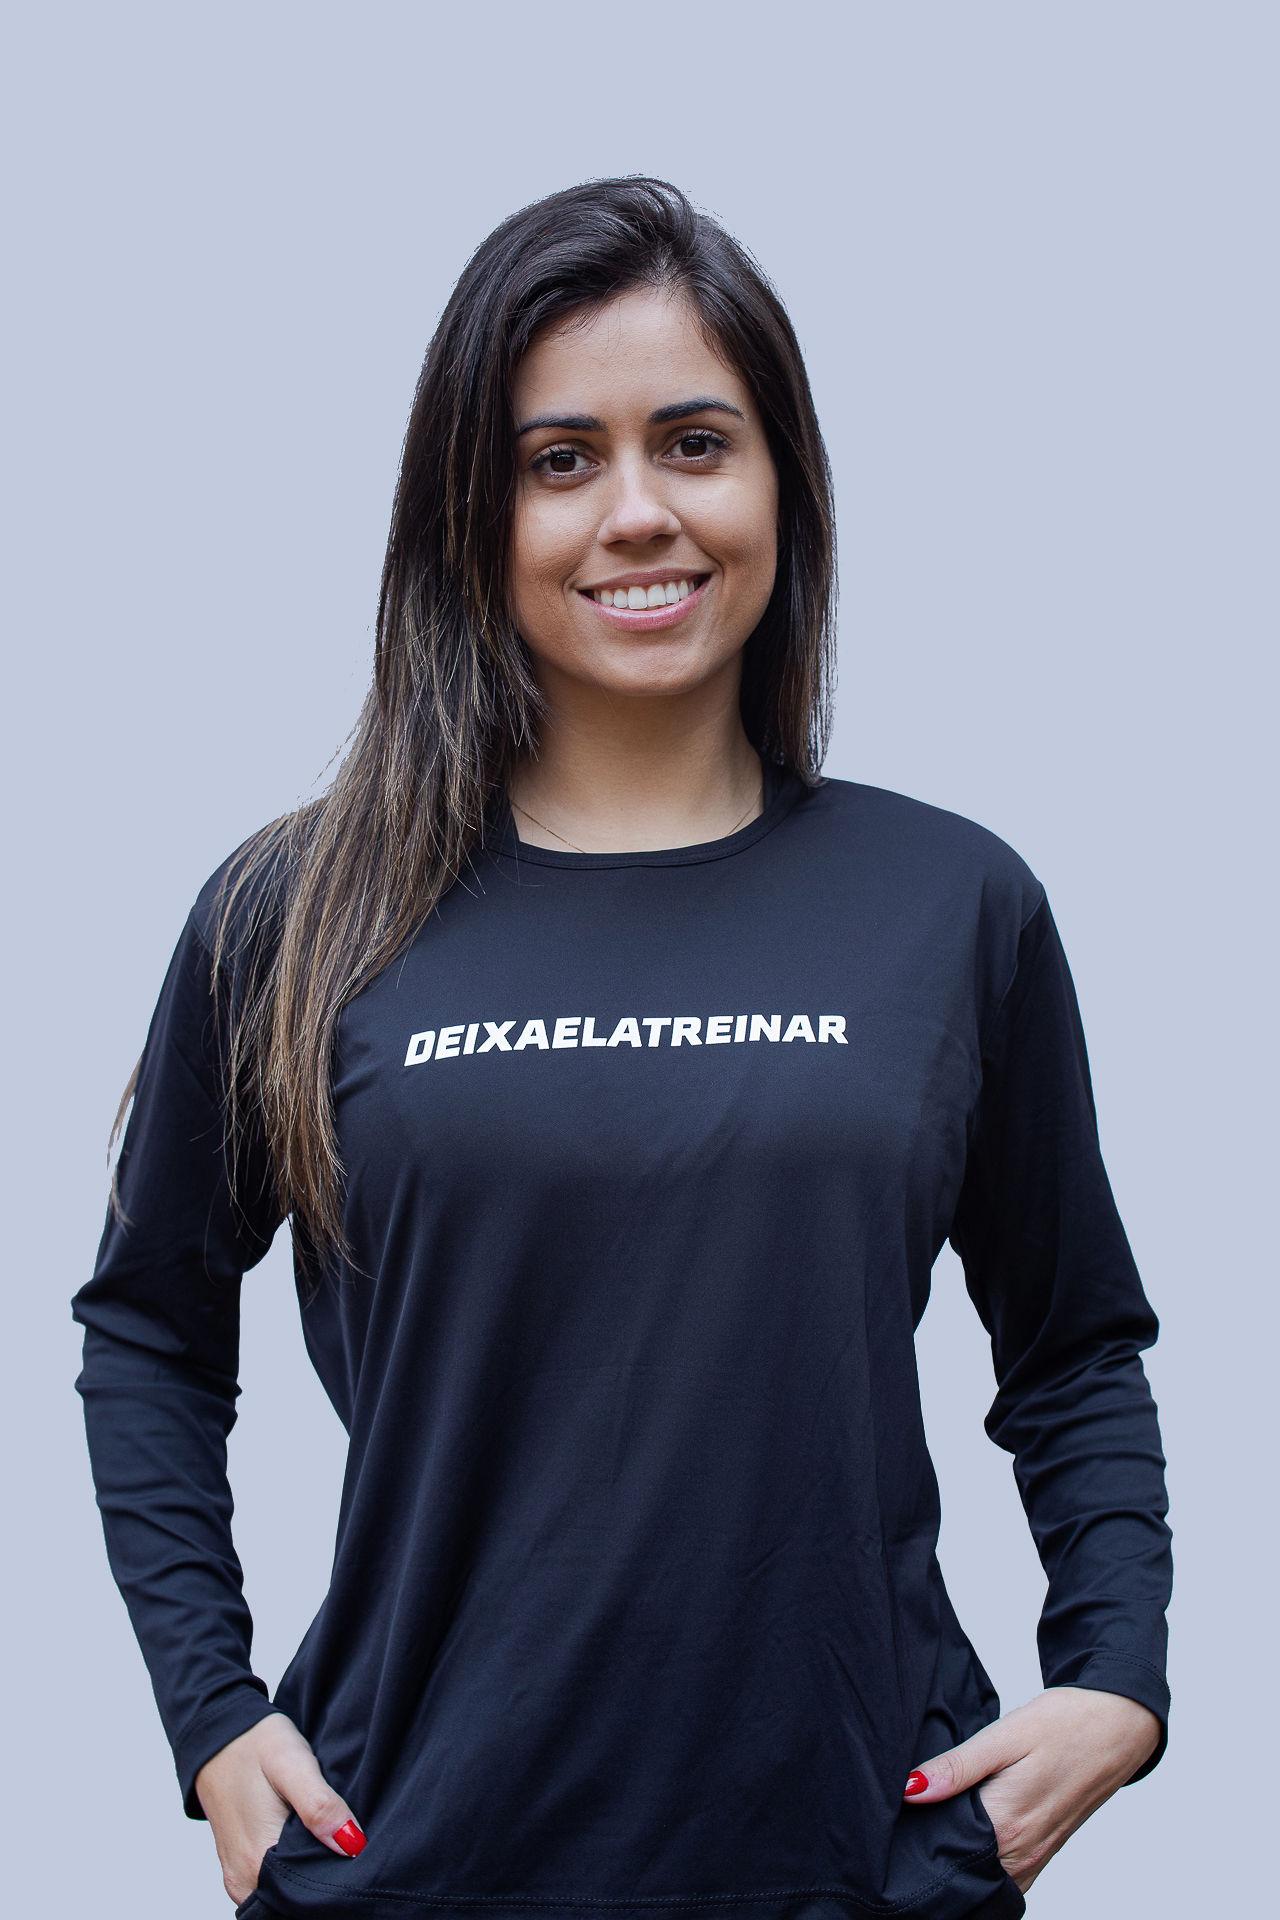 Camiseta (baby look) Deixa Ela Treinar Preto Básico (manga longa)